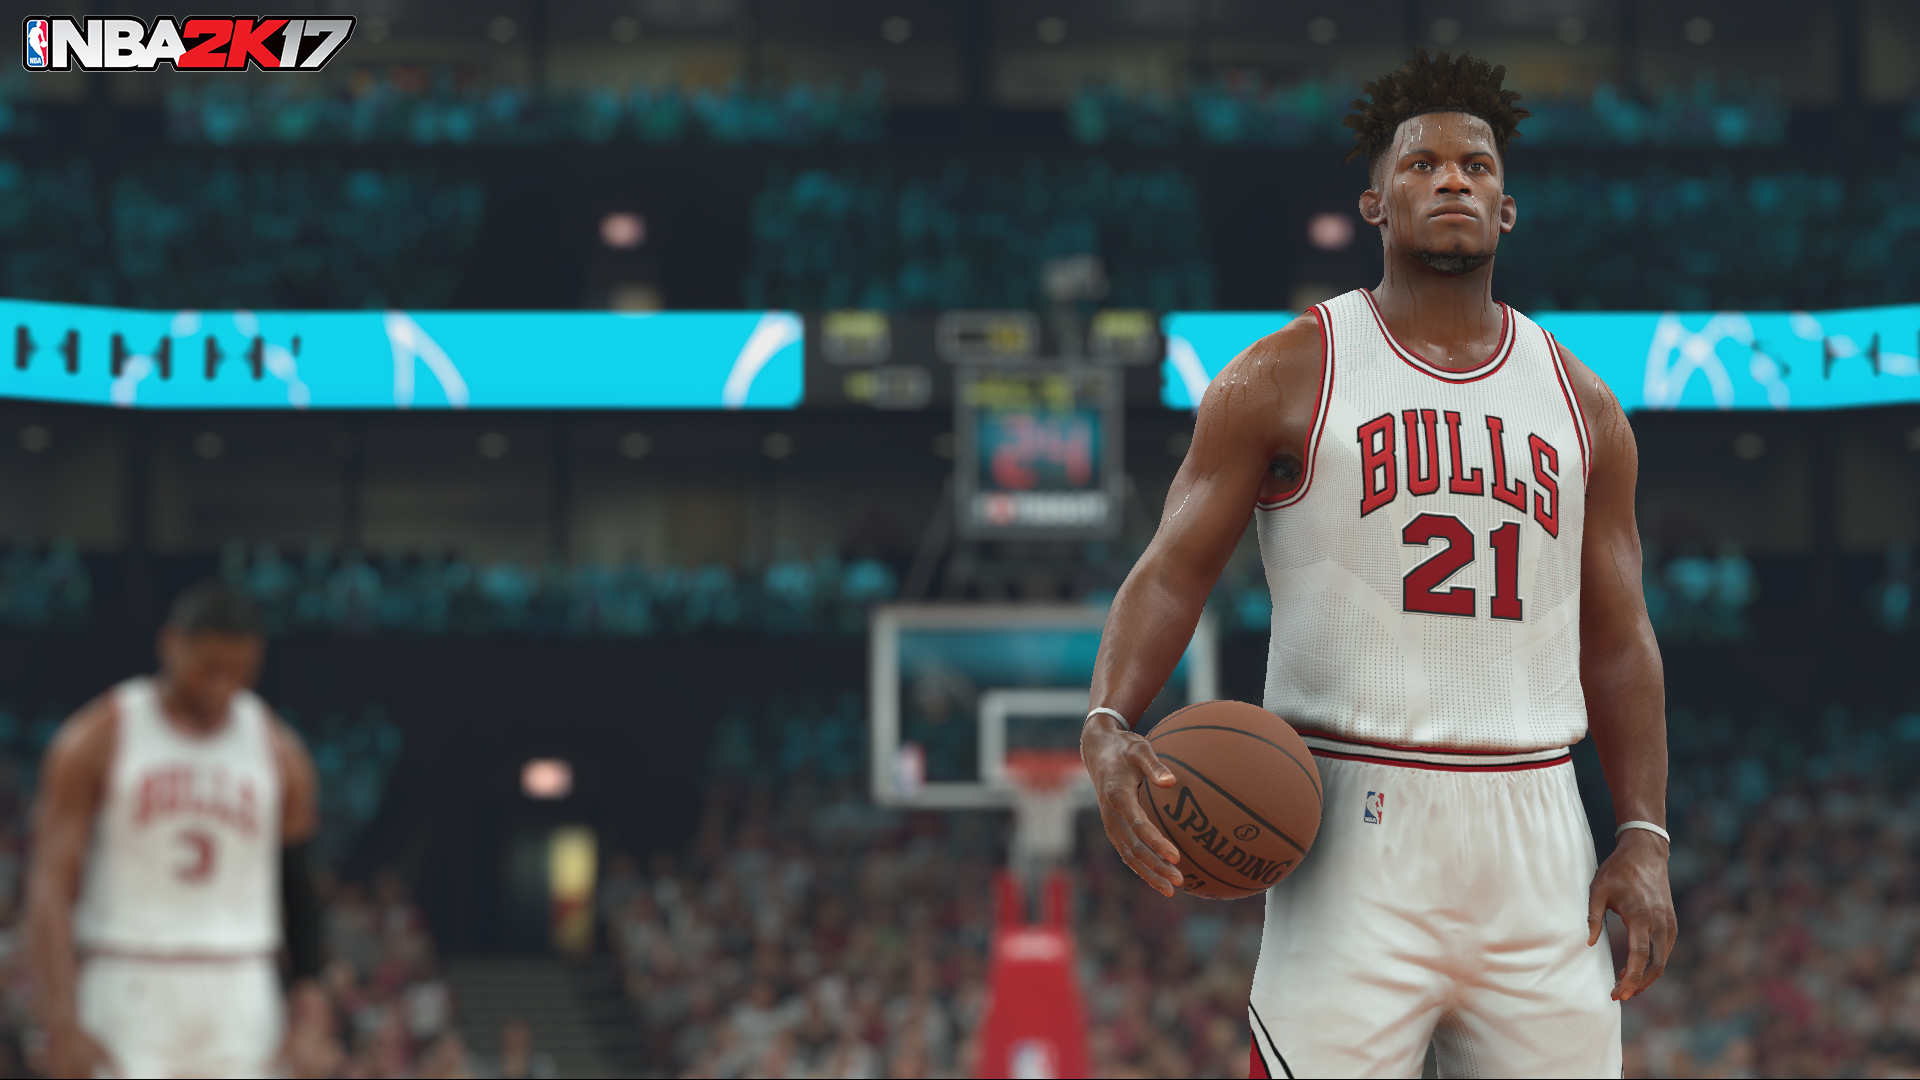 NBA 2K17 Screenshot 1